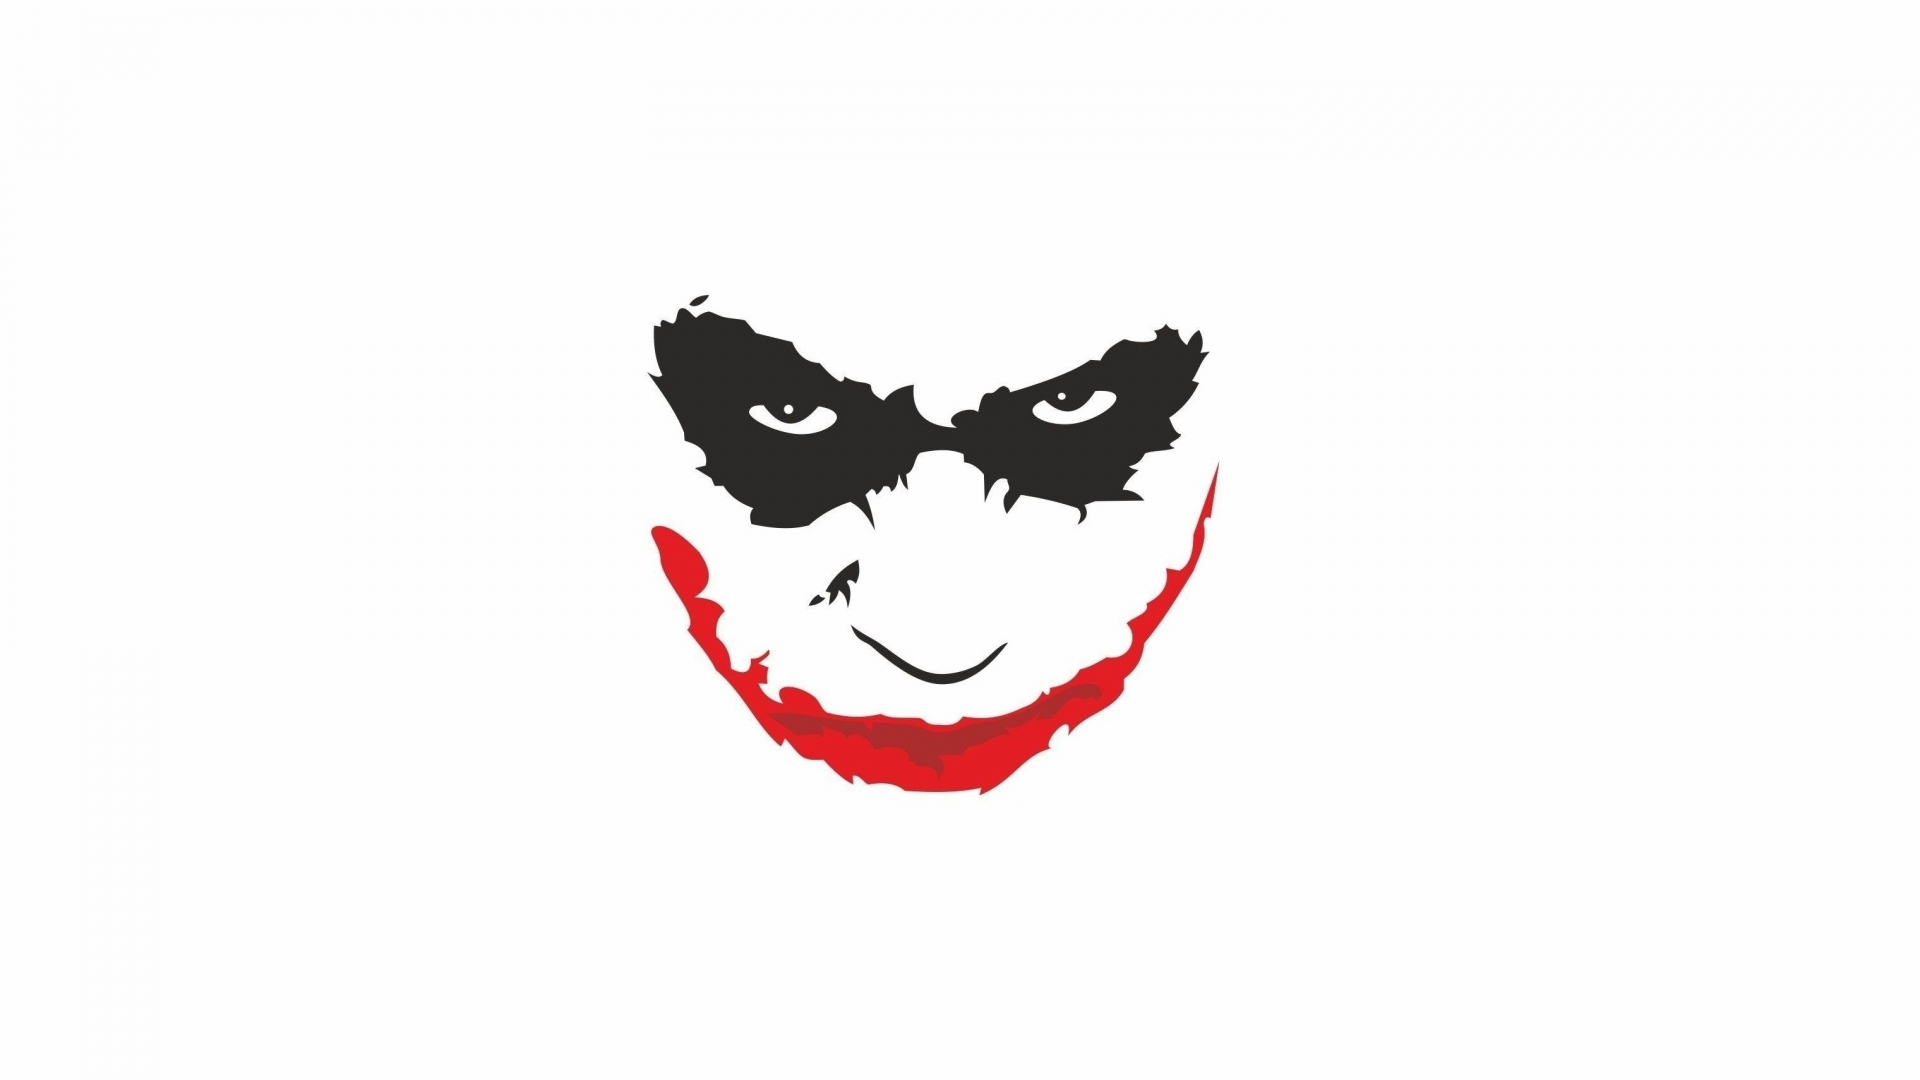 joker wallpaper hd rain